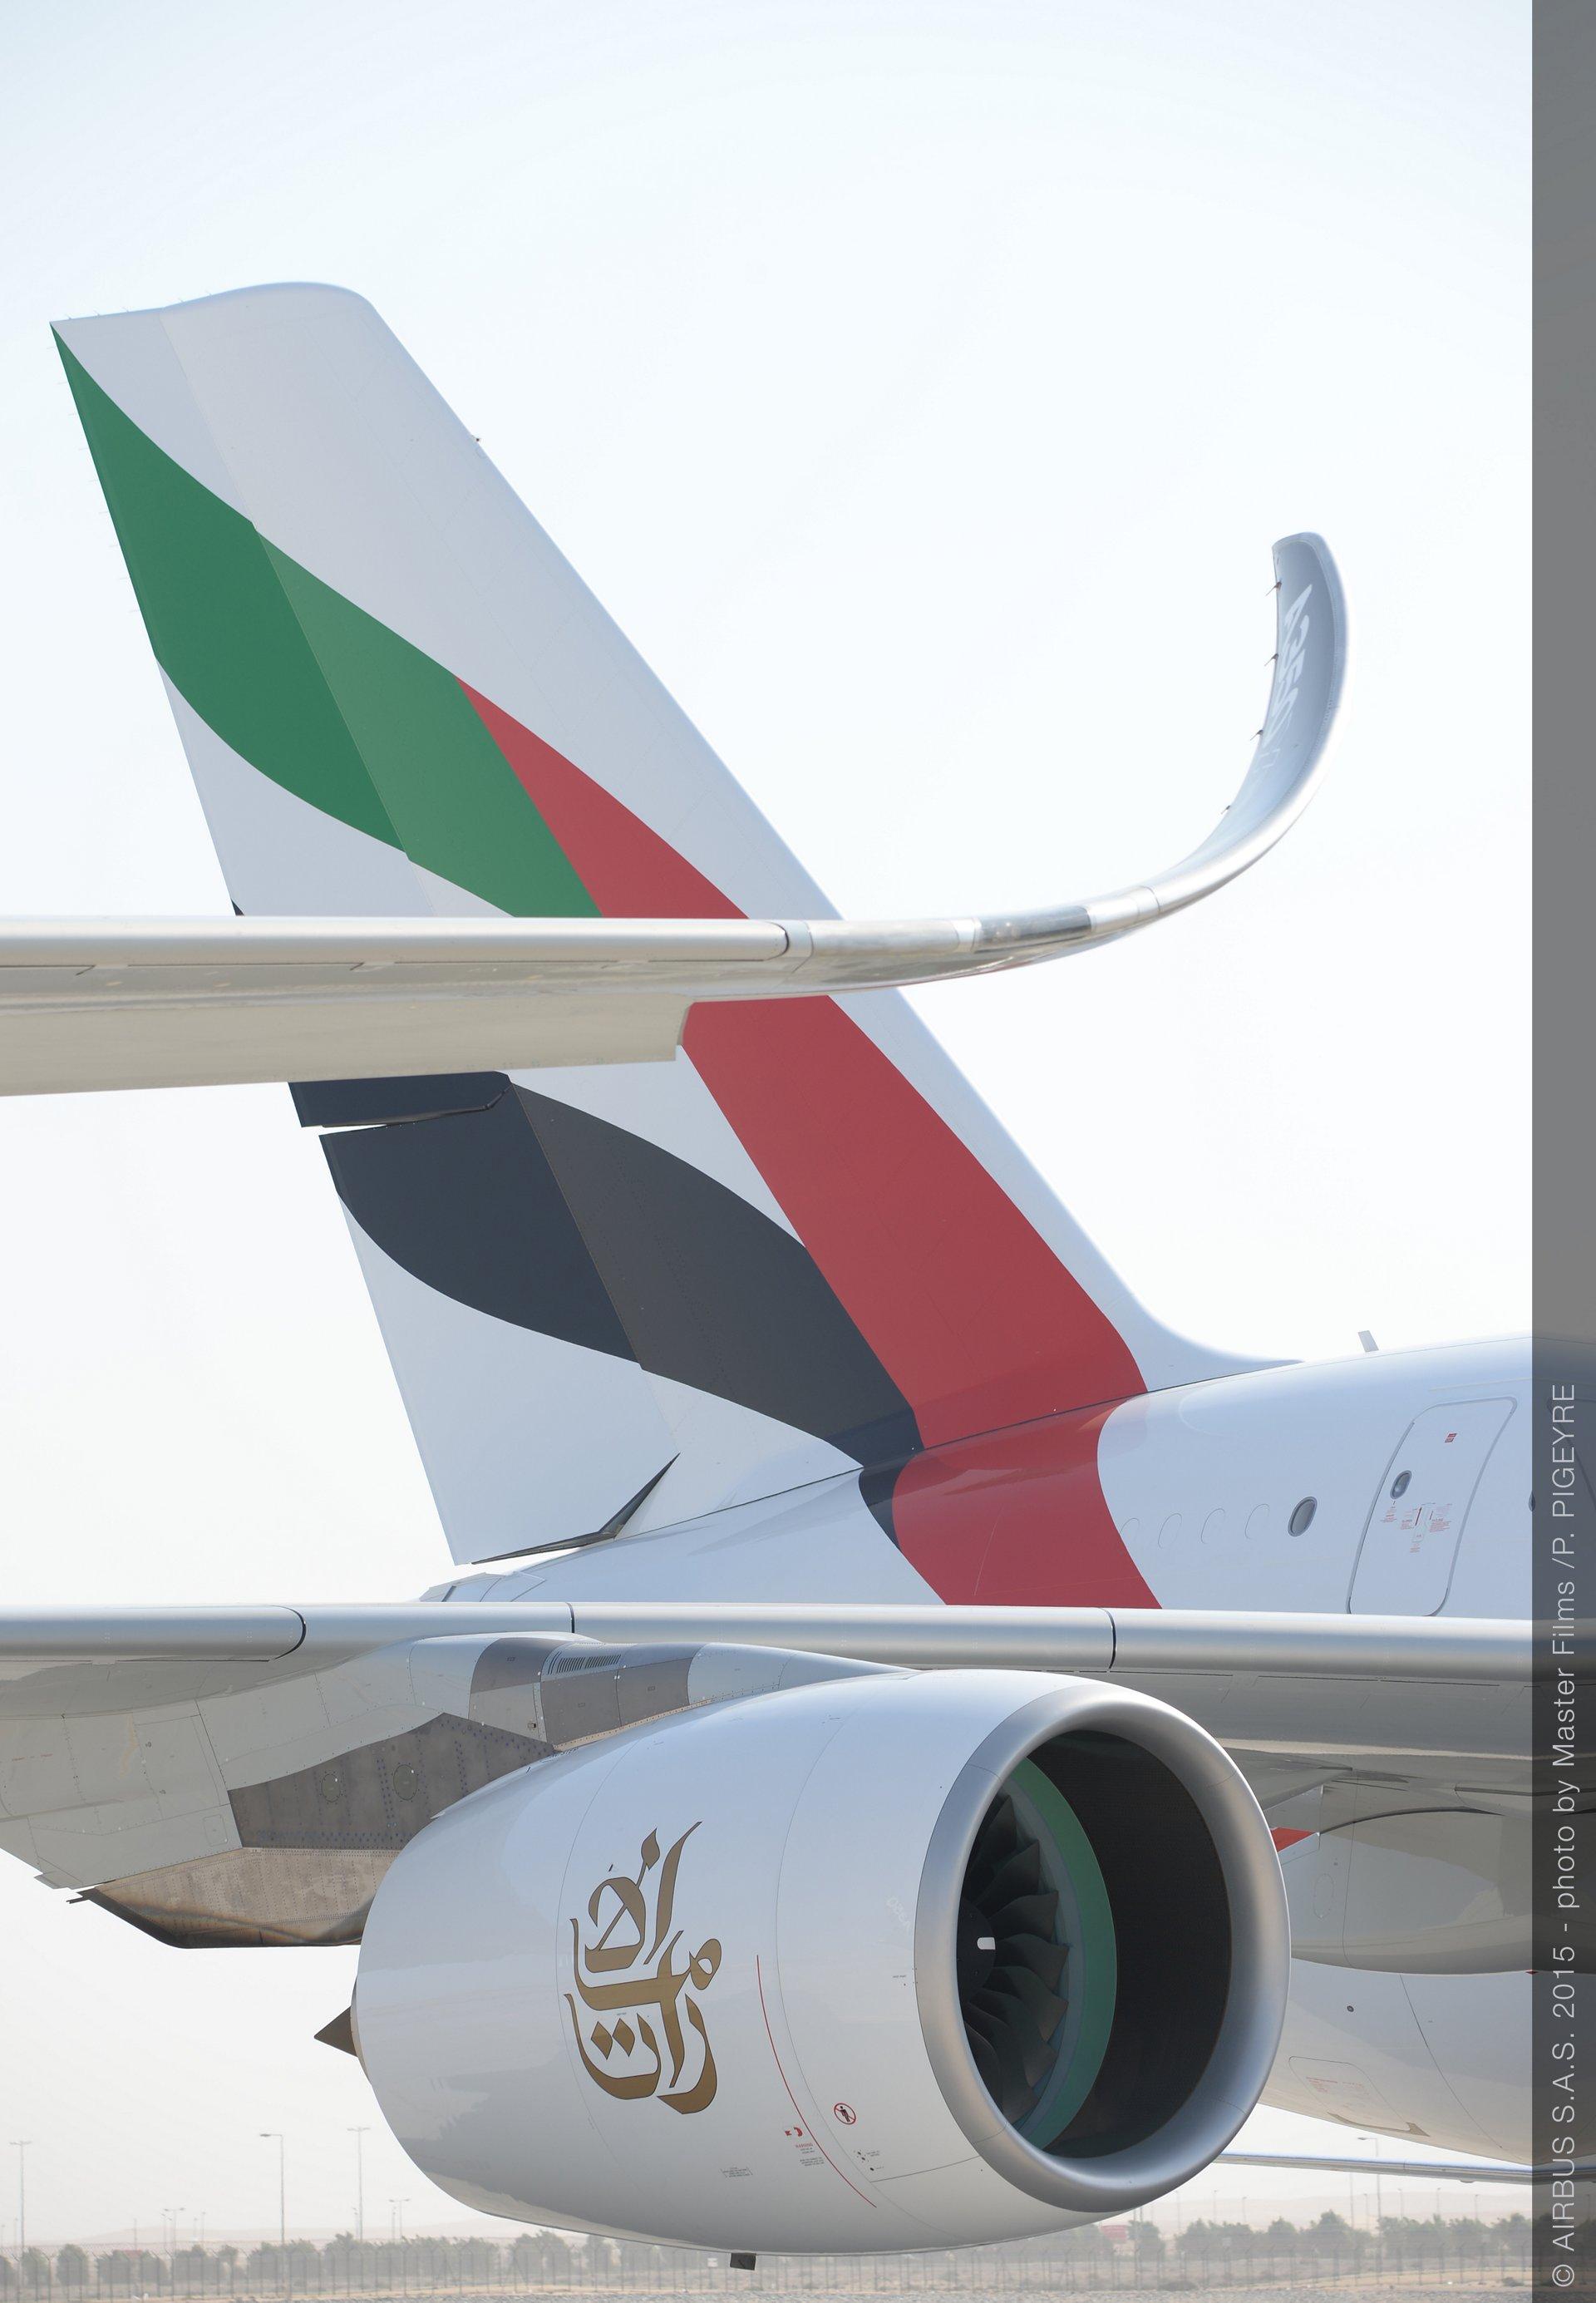 Dubai_2015_Day_2_Emirates A380 1